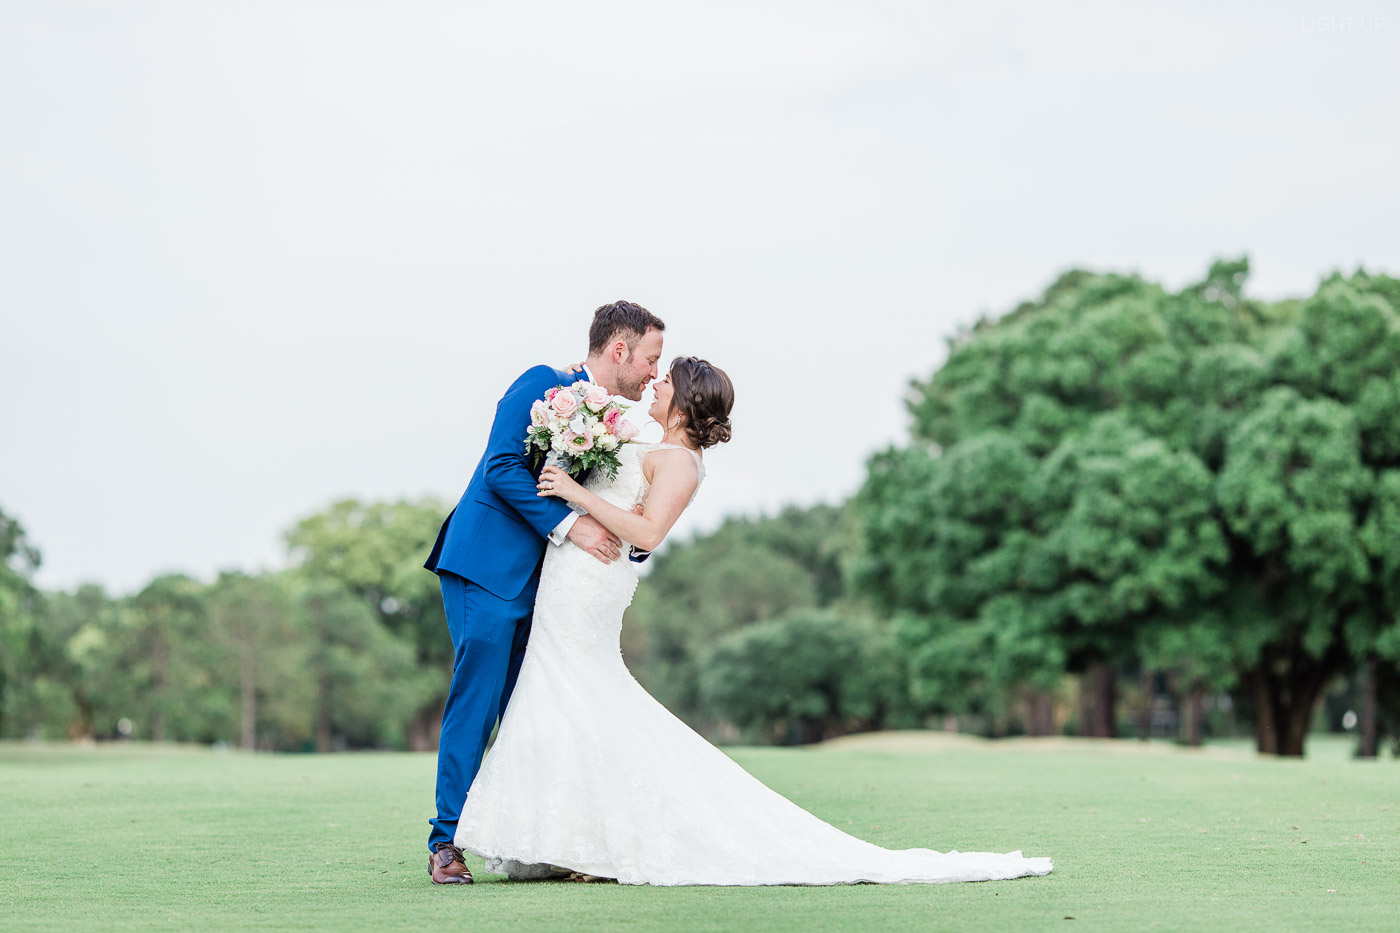 hstoric-dubsdread-wedding-orlando-28.jpg